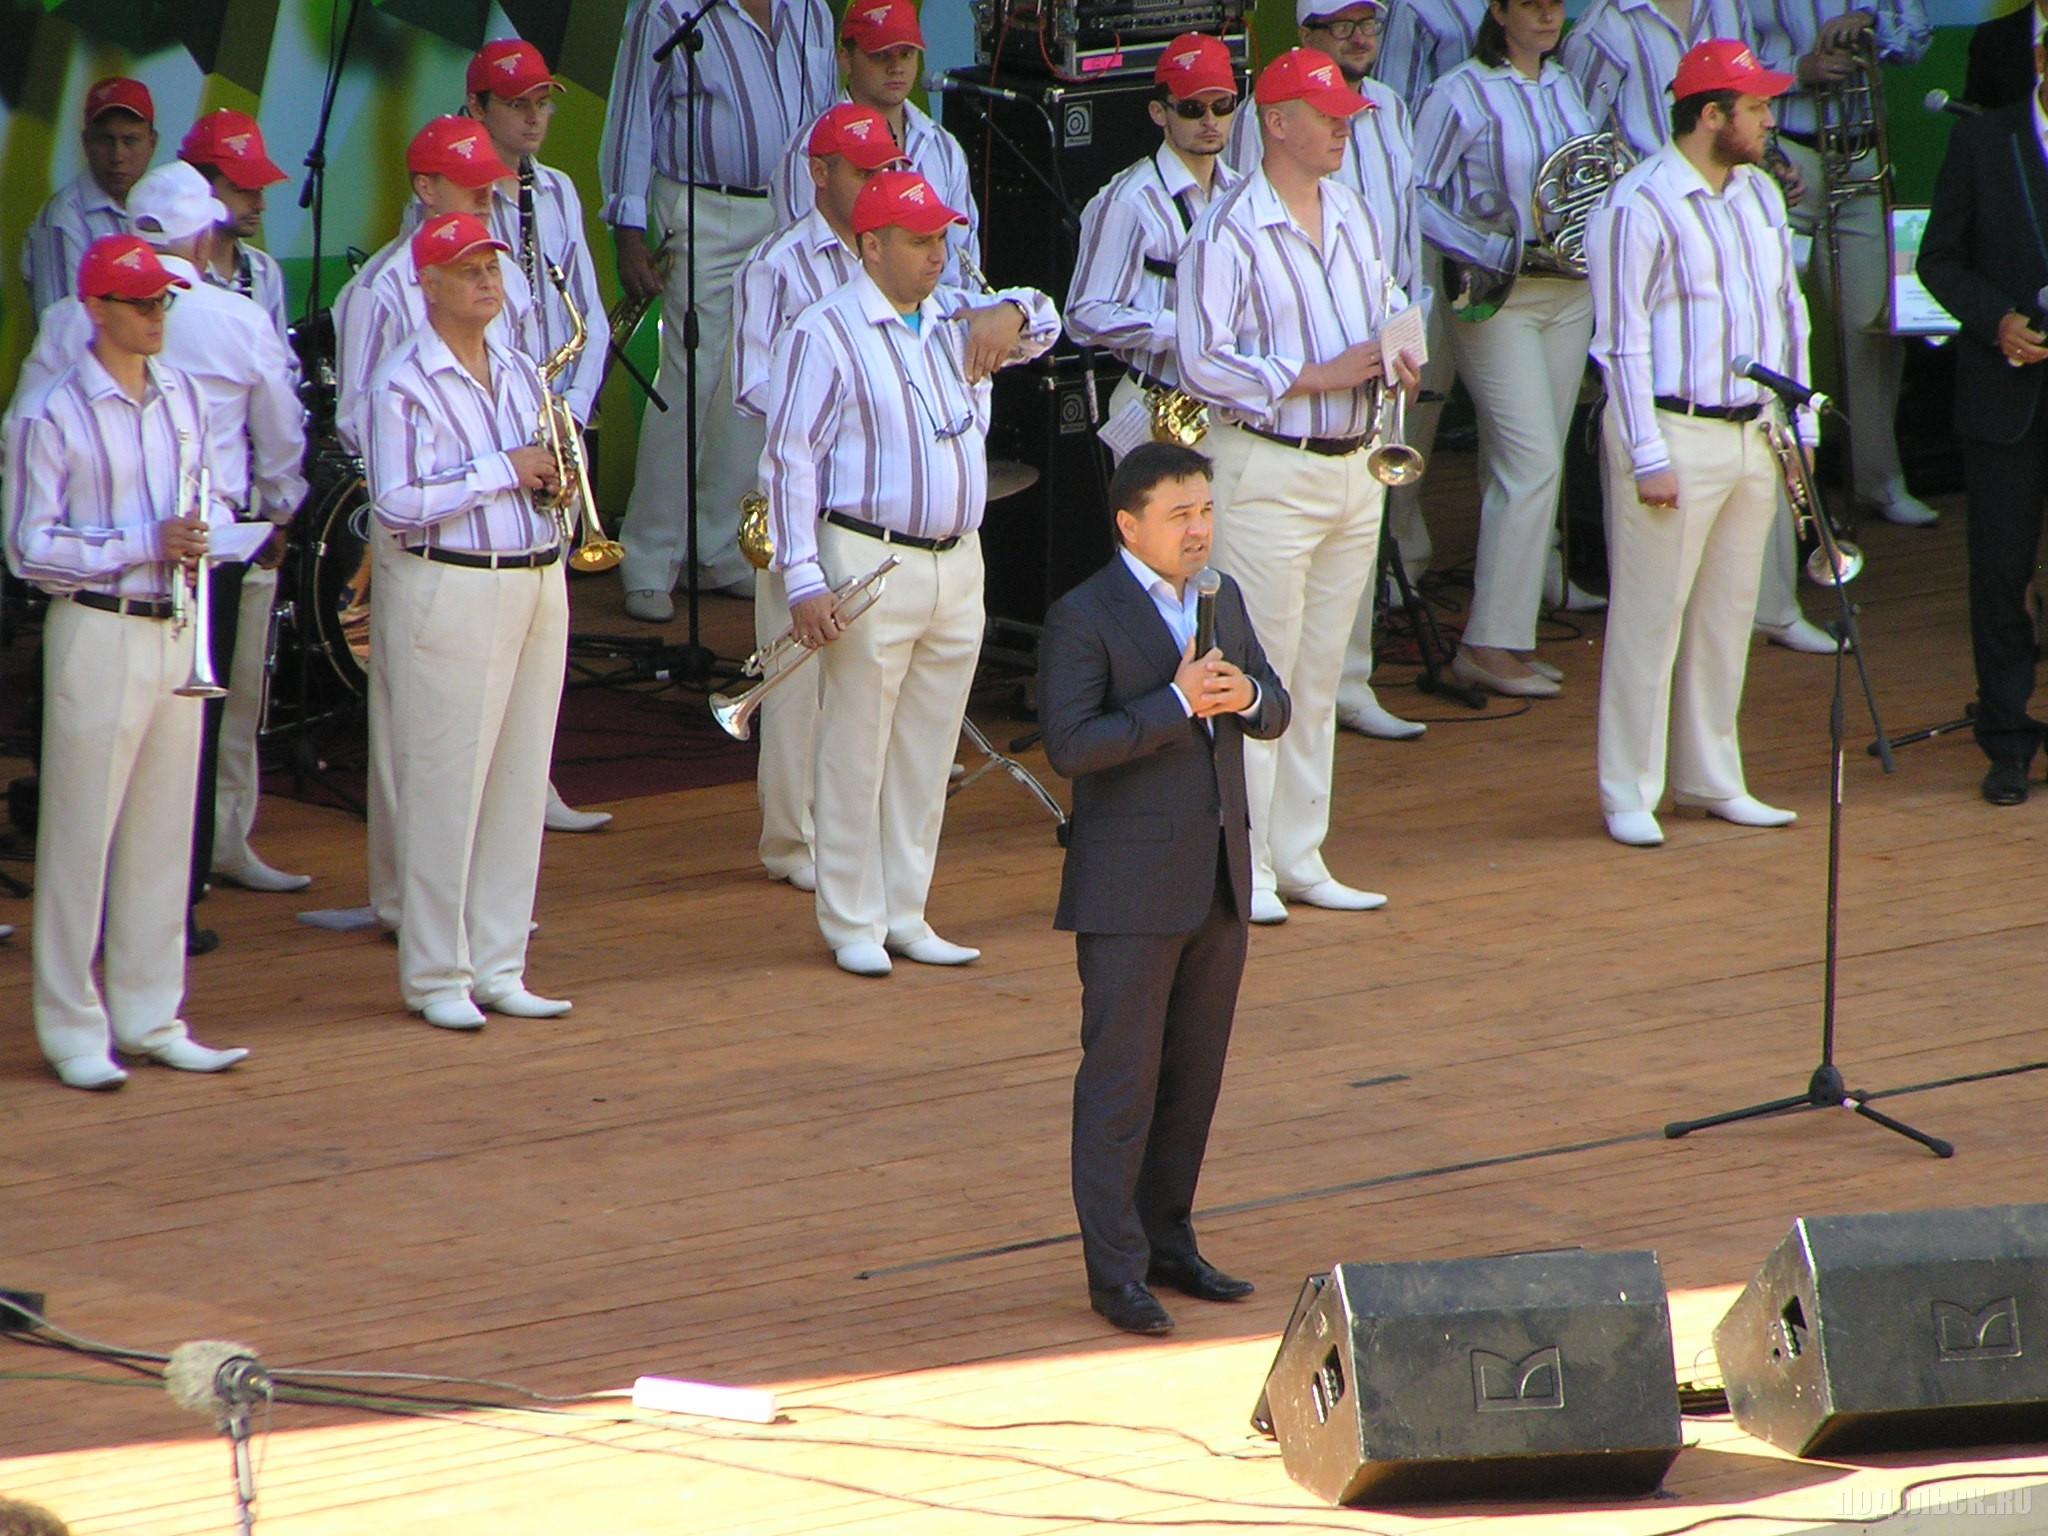 23 августа 2014 г. Губернатор.